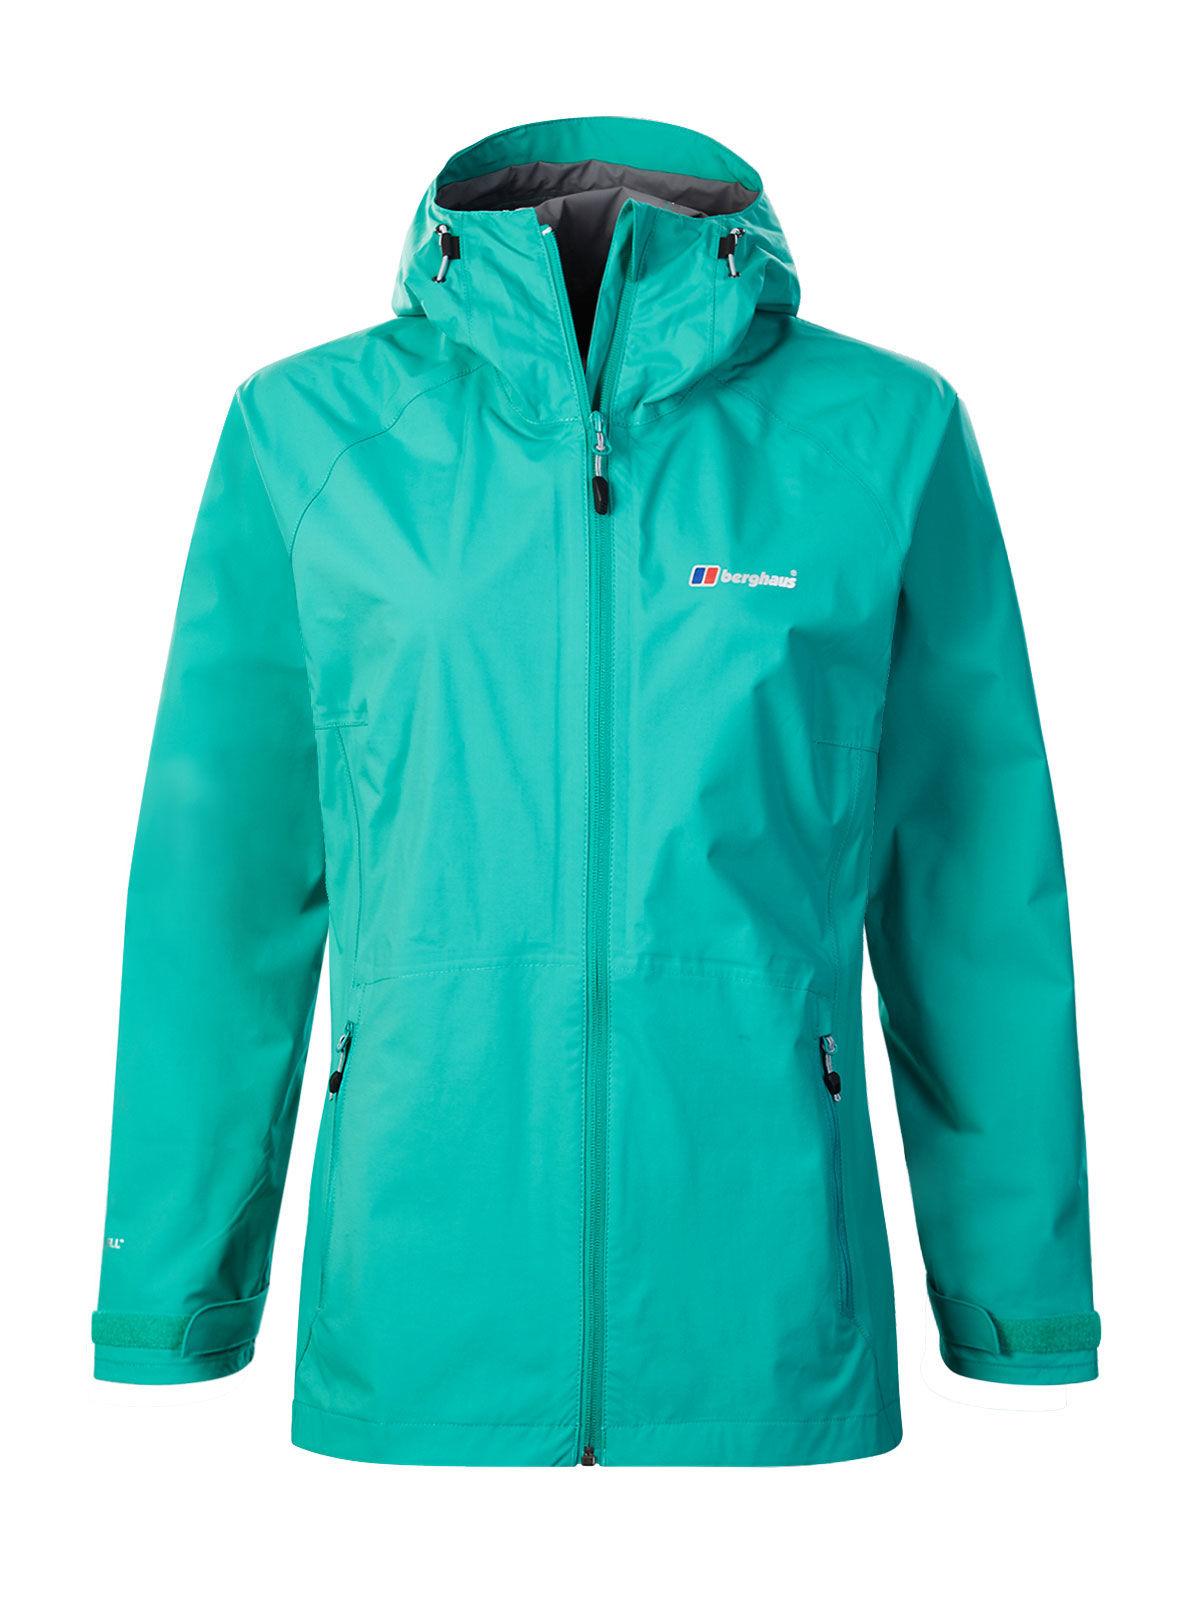 Berghaus Stormcloud Shell Jkt Af Grn/gry, ženska pohodna jakna, zelena